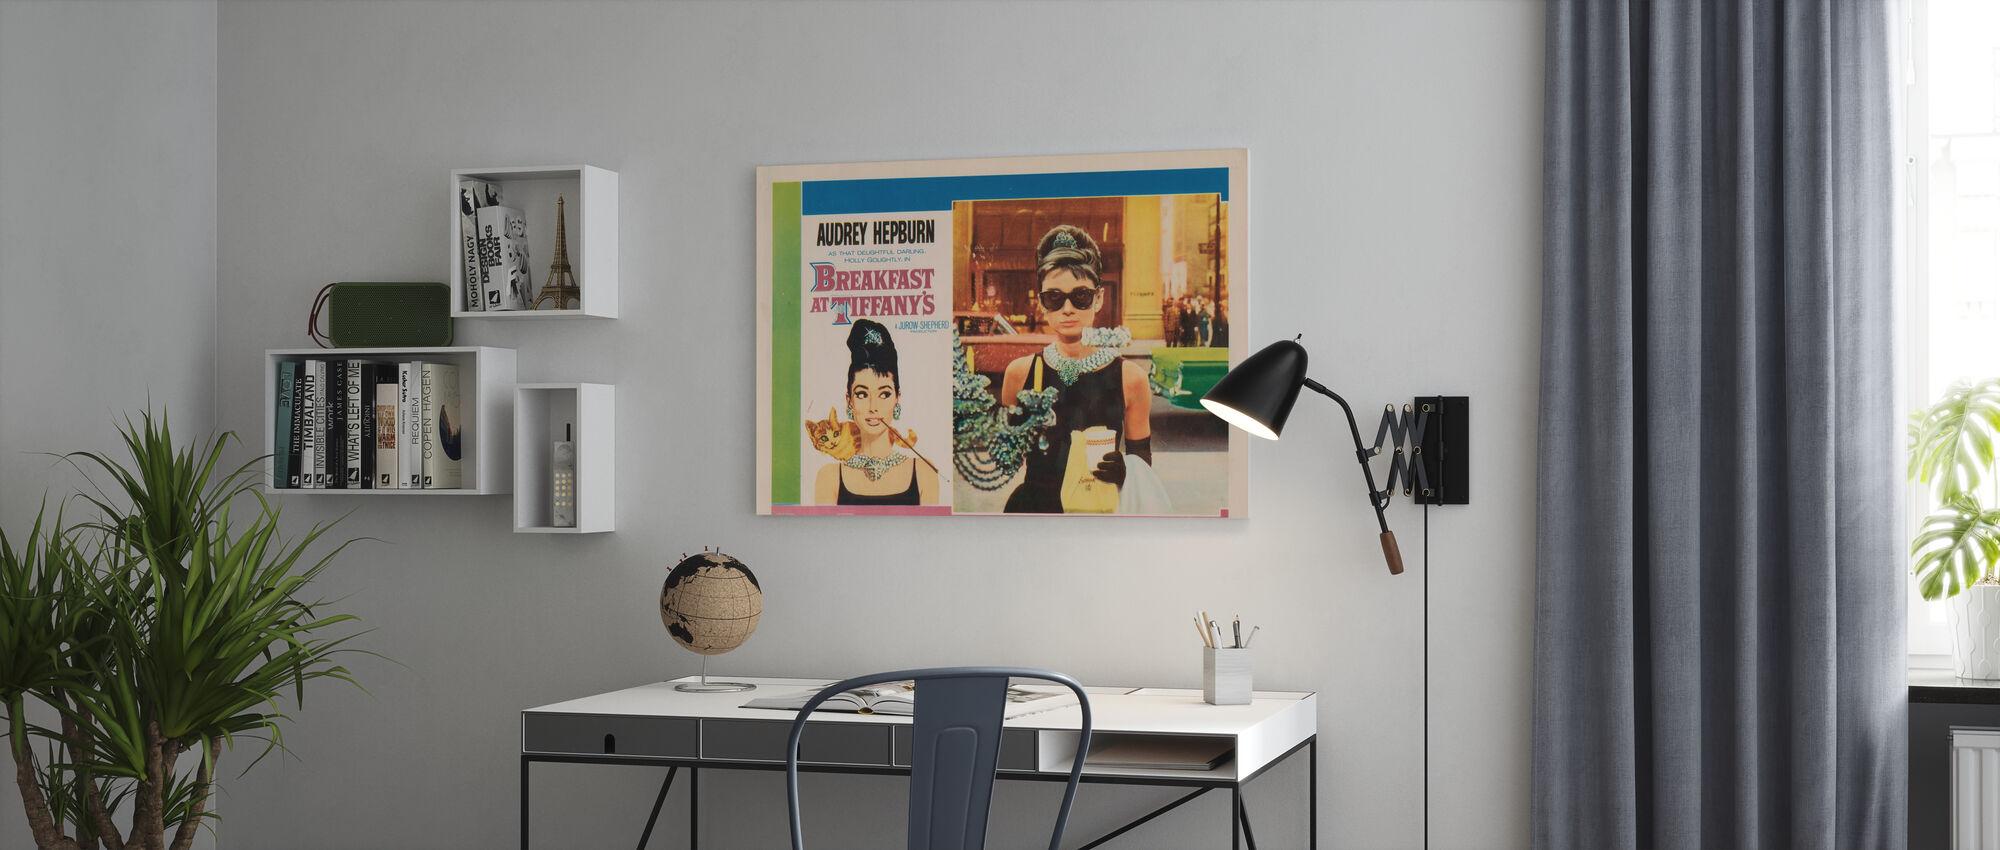 Film plakat frokost på Tiffany's - Lerretsbilde - Kontor